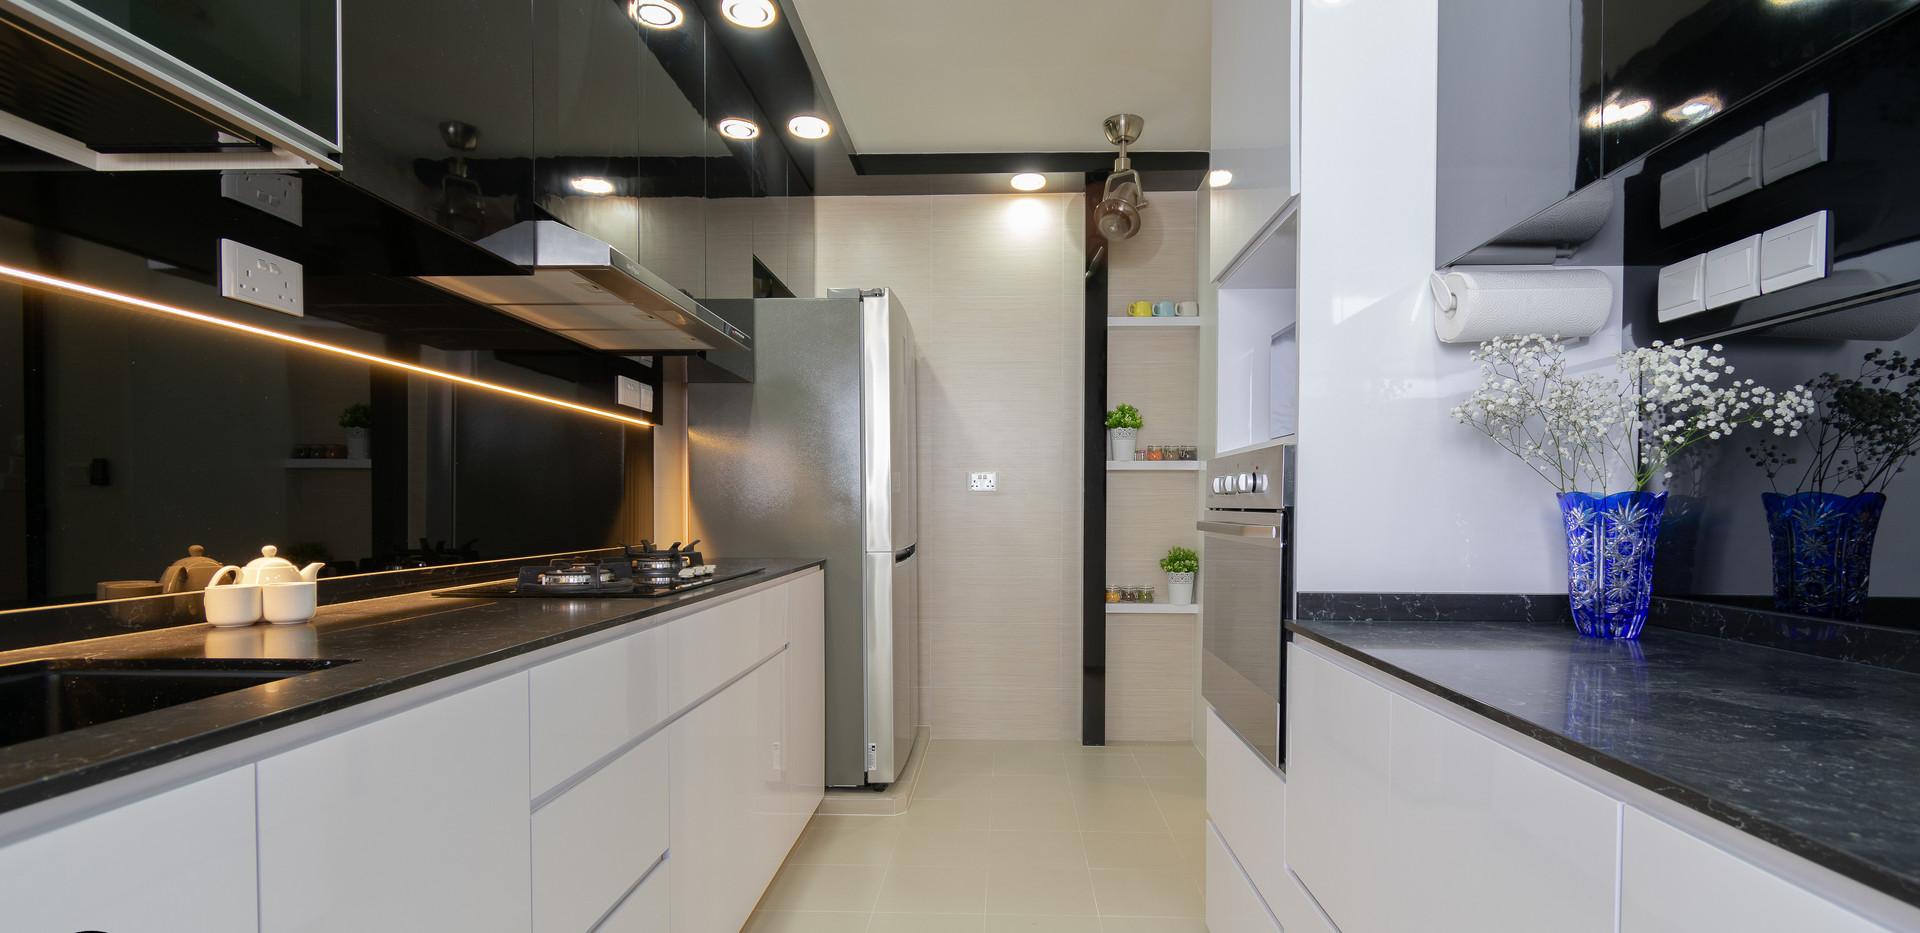 445A Bukit Batok WestAvenue8